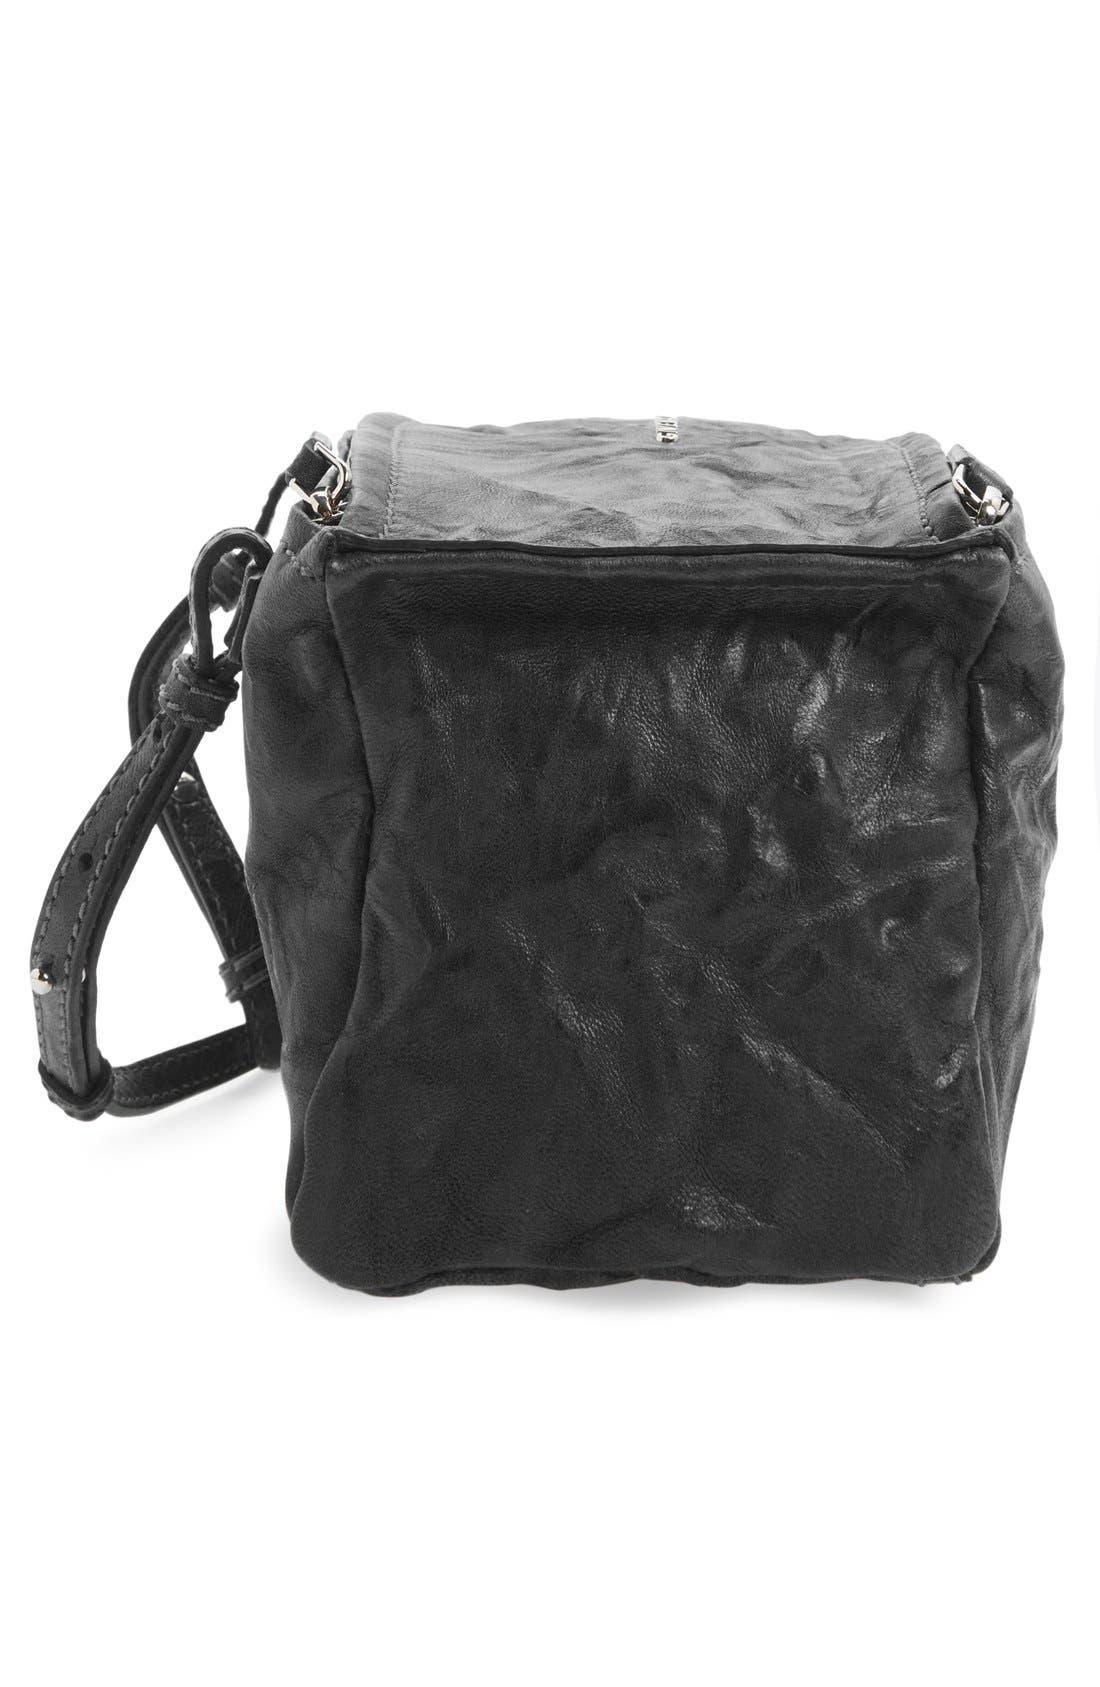 'Mini Pepe Pandora' Leather Shoulder Bag,                             Alternate thumbnail 3, color,                             BLACK